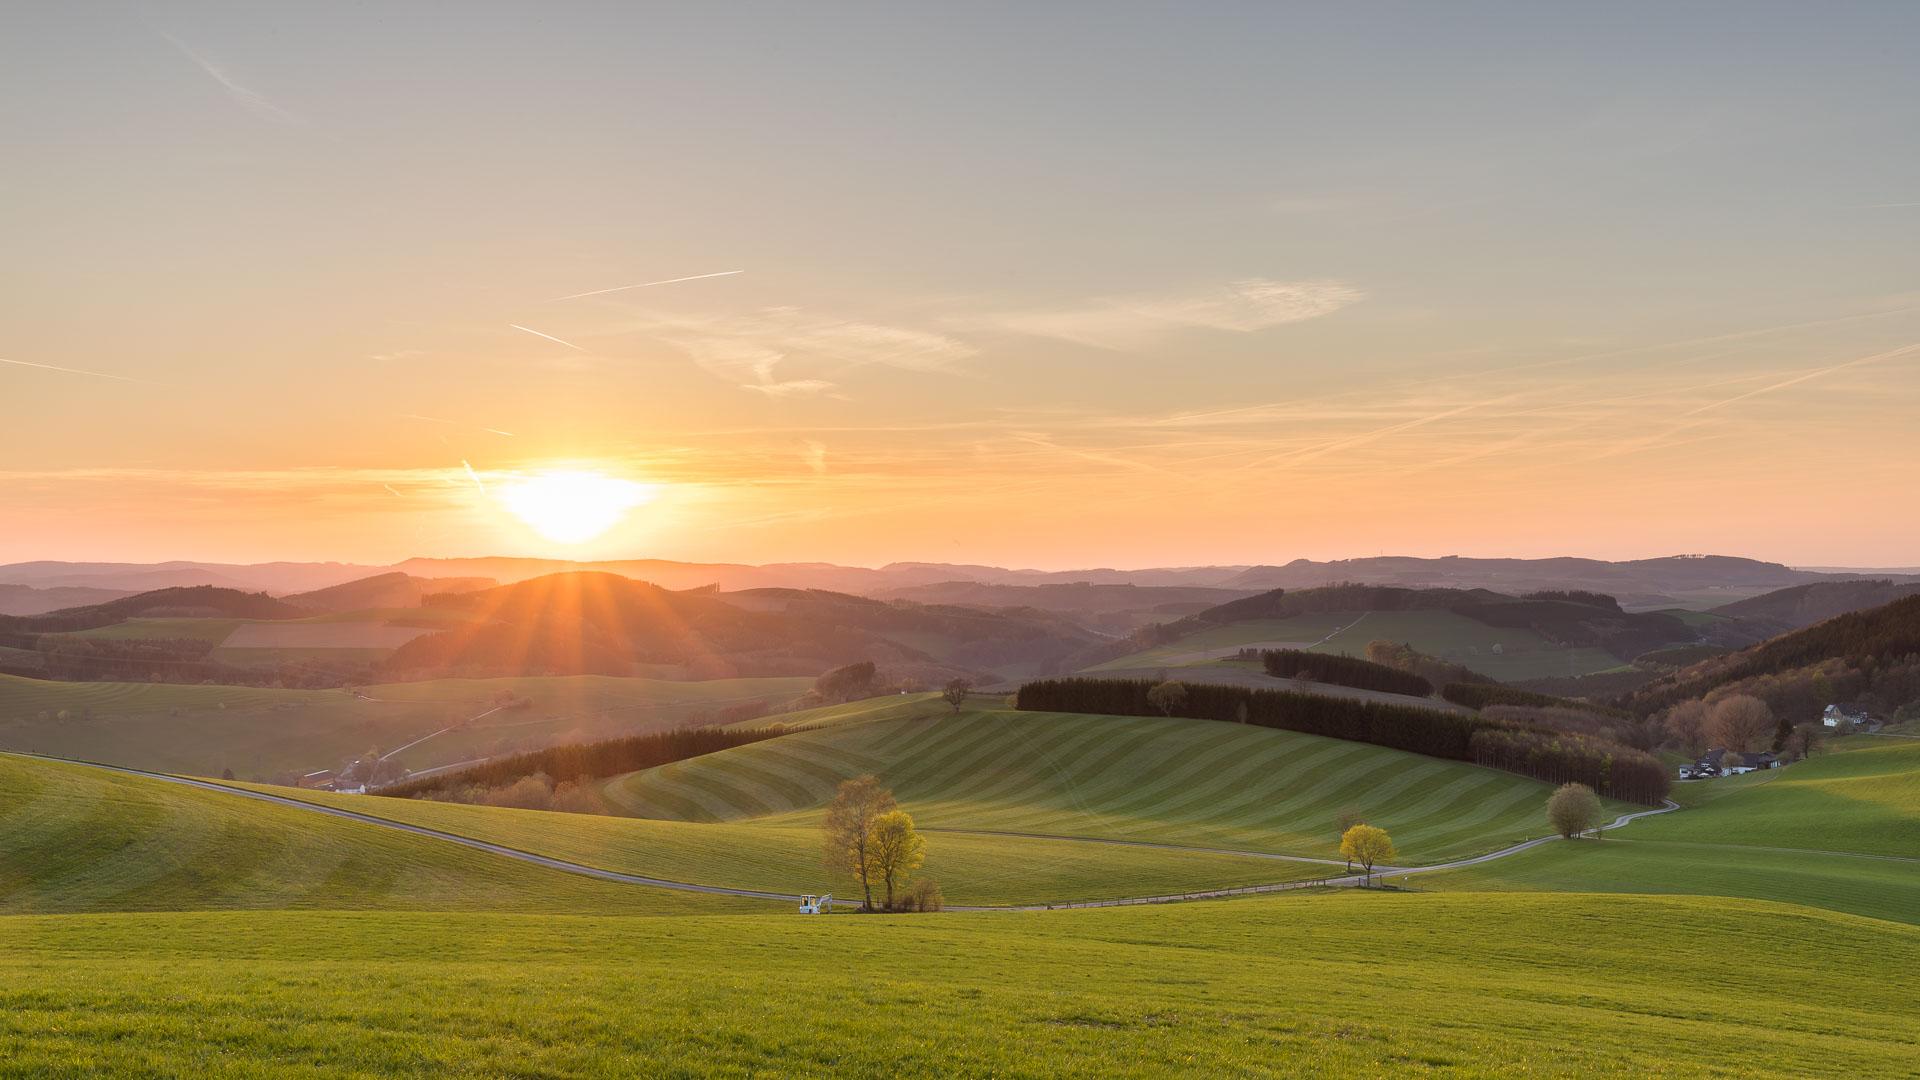 Sonnenuntergang in Oberhenneborn